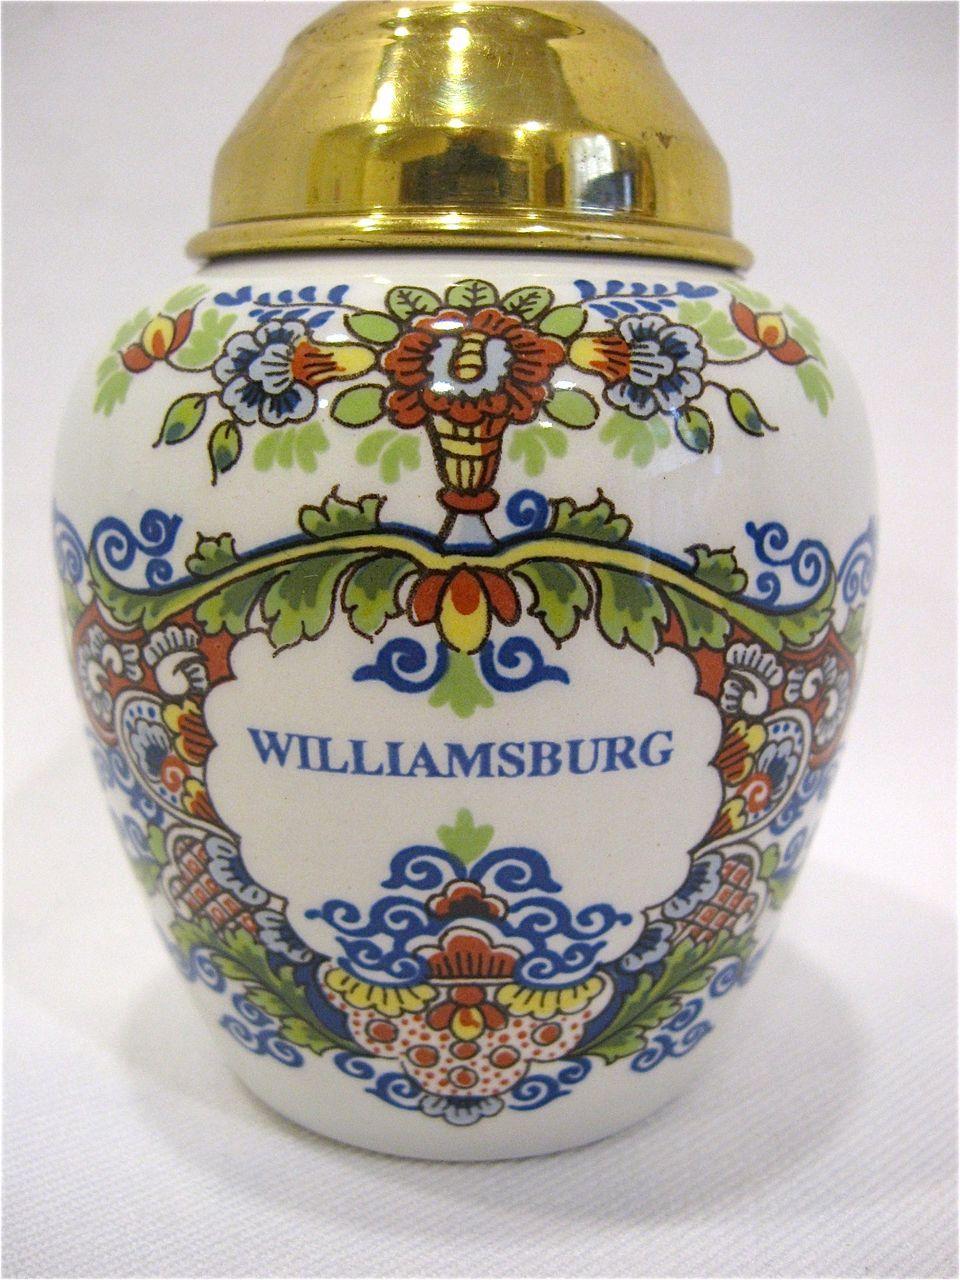 Small Polychrome Delft Williamsburg Tobacco Jar from ...